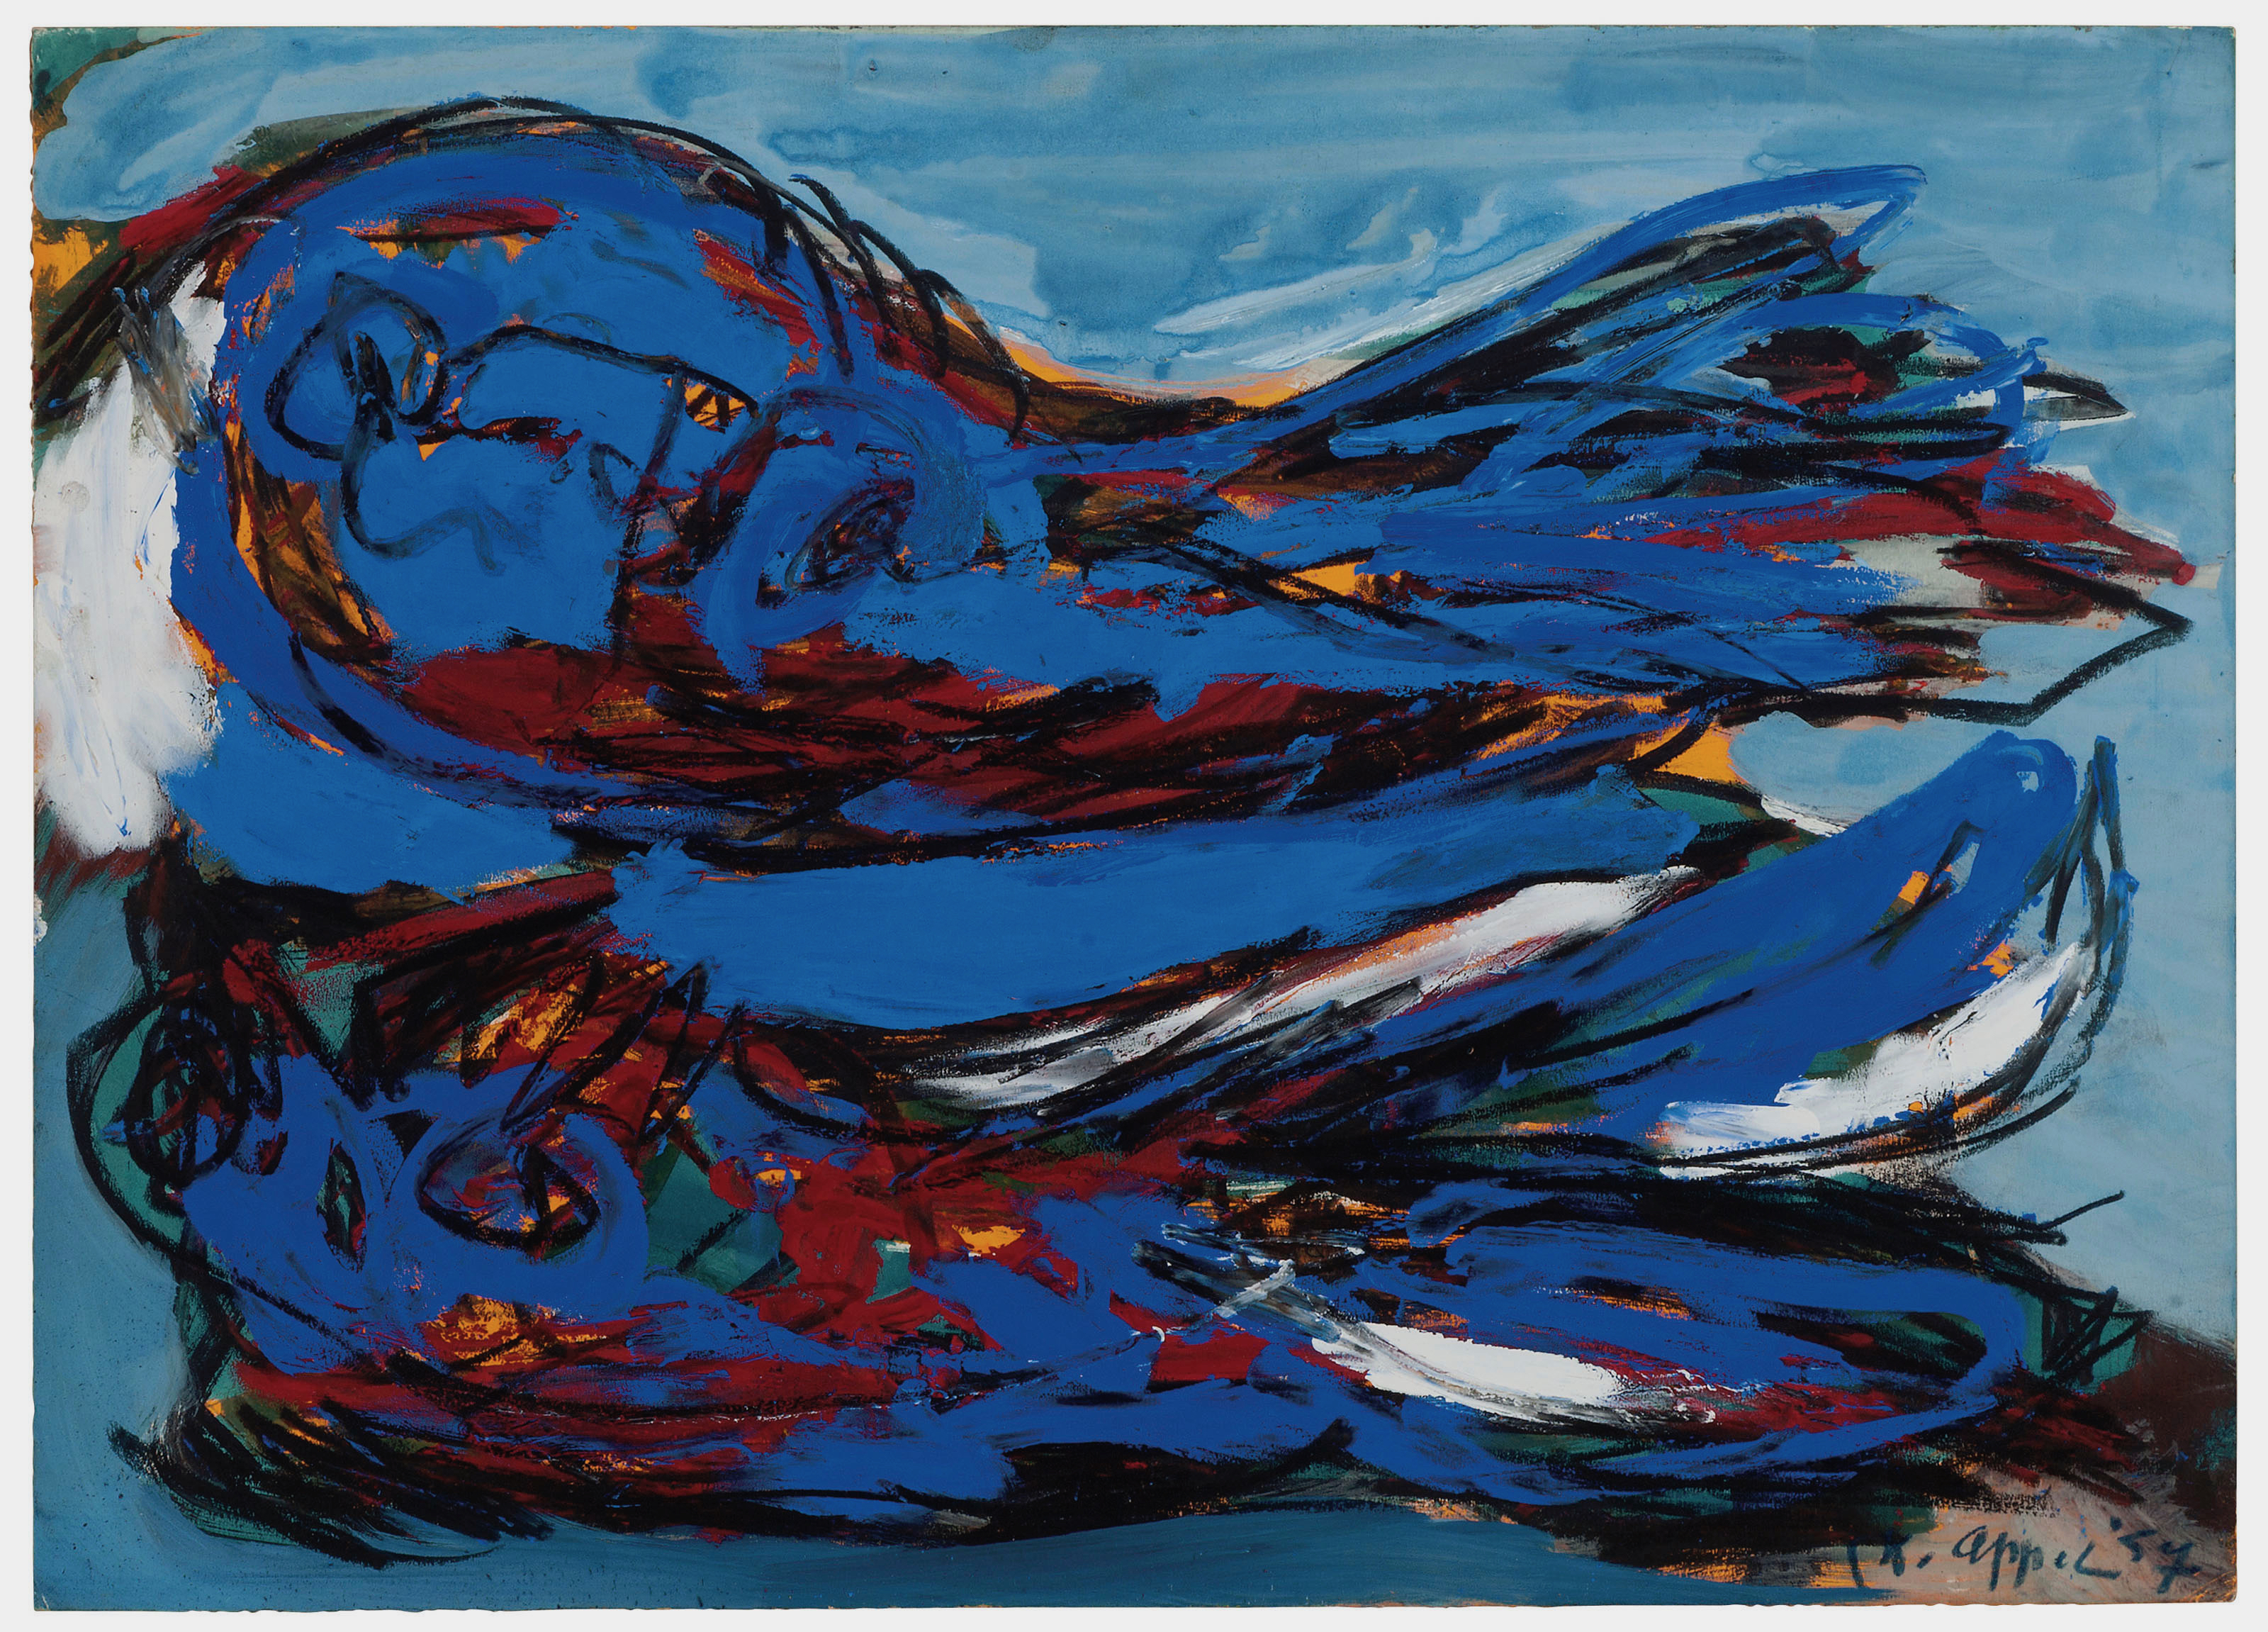 Karel Appel 1957 gouache